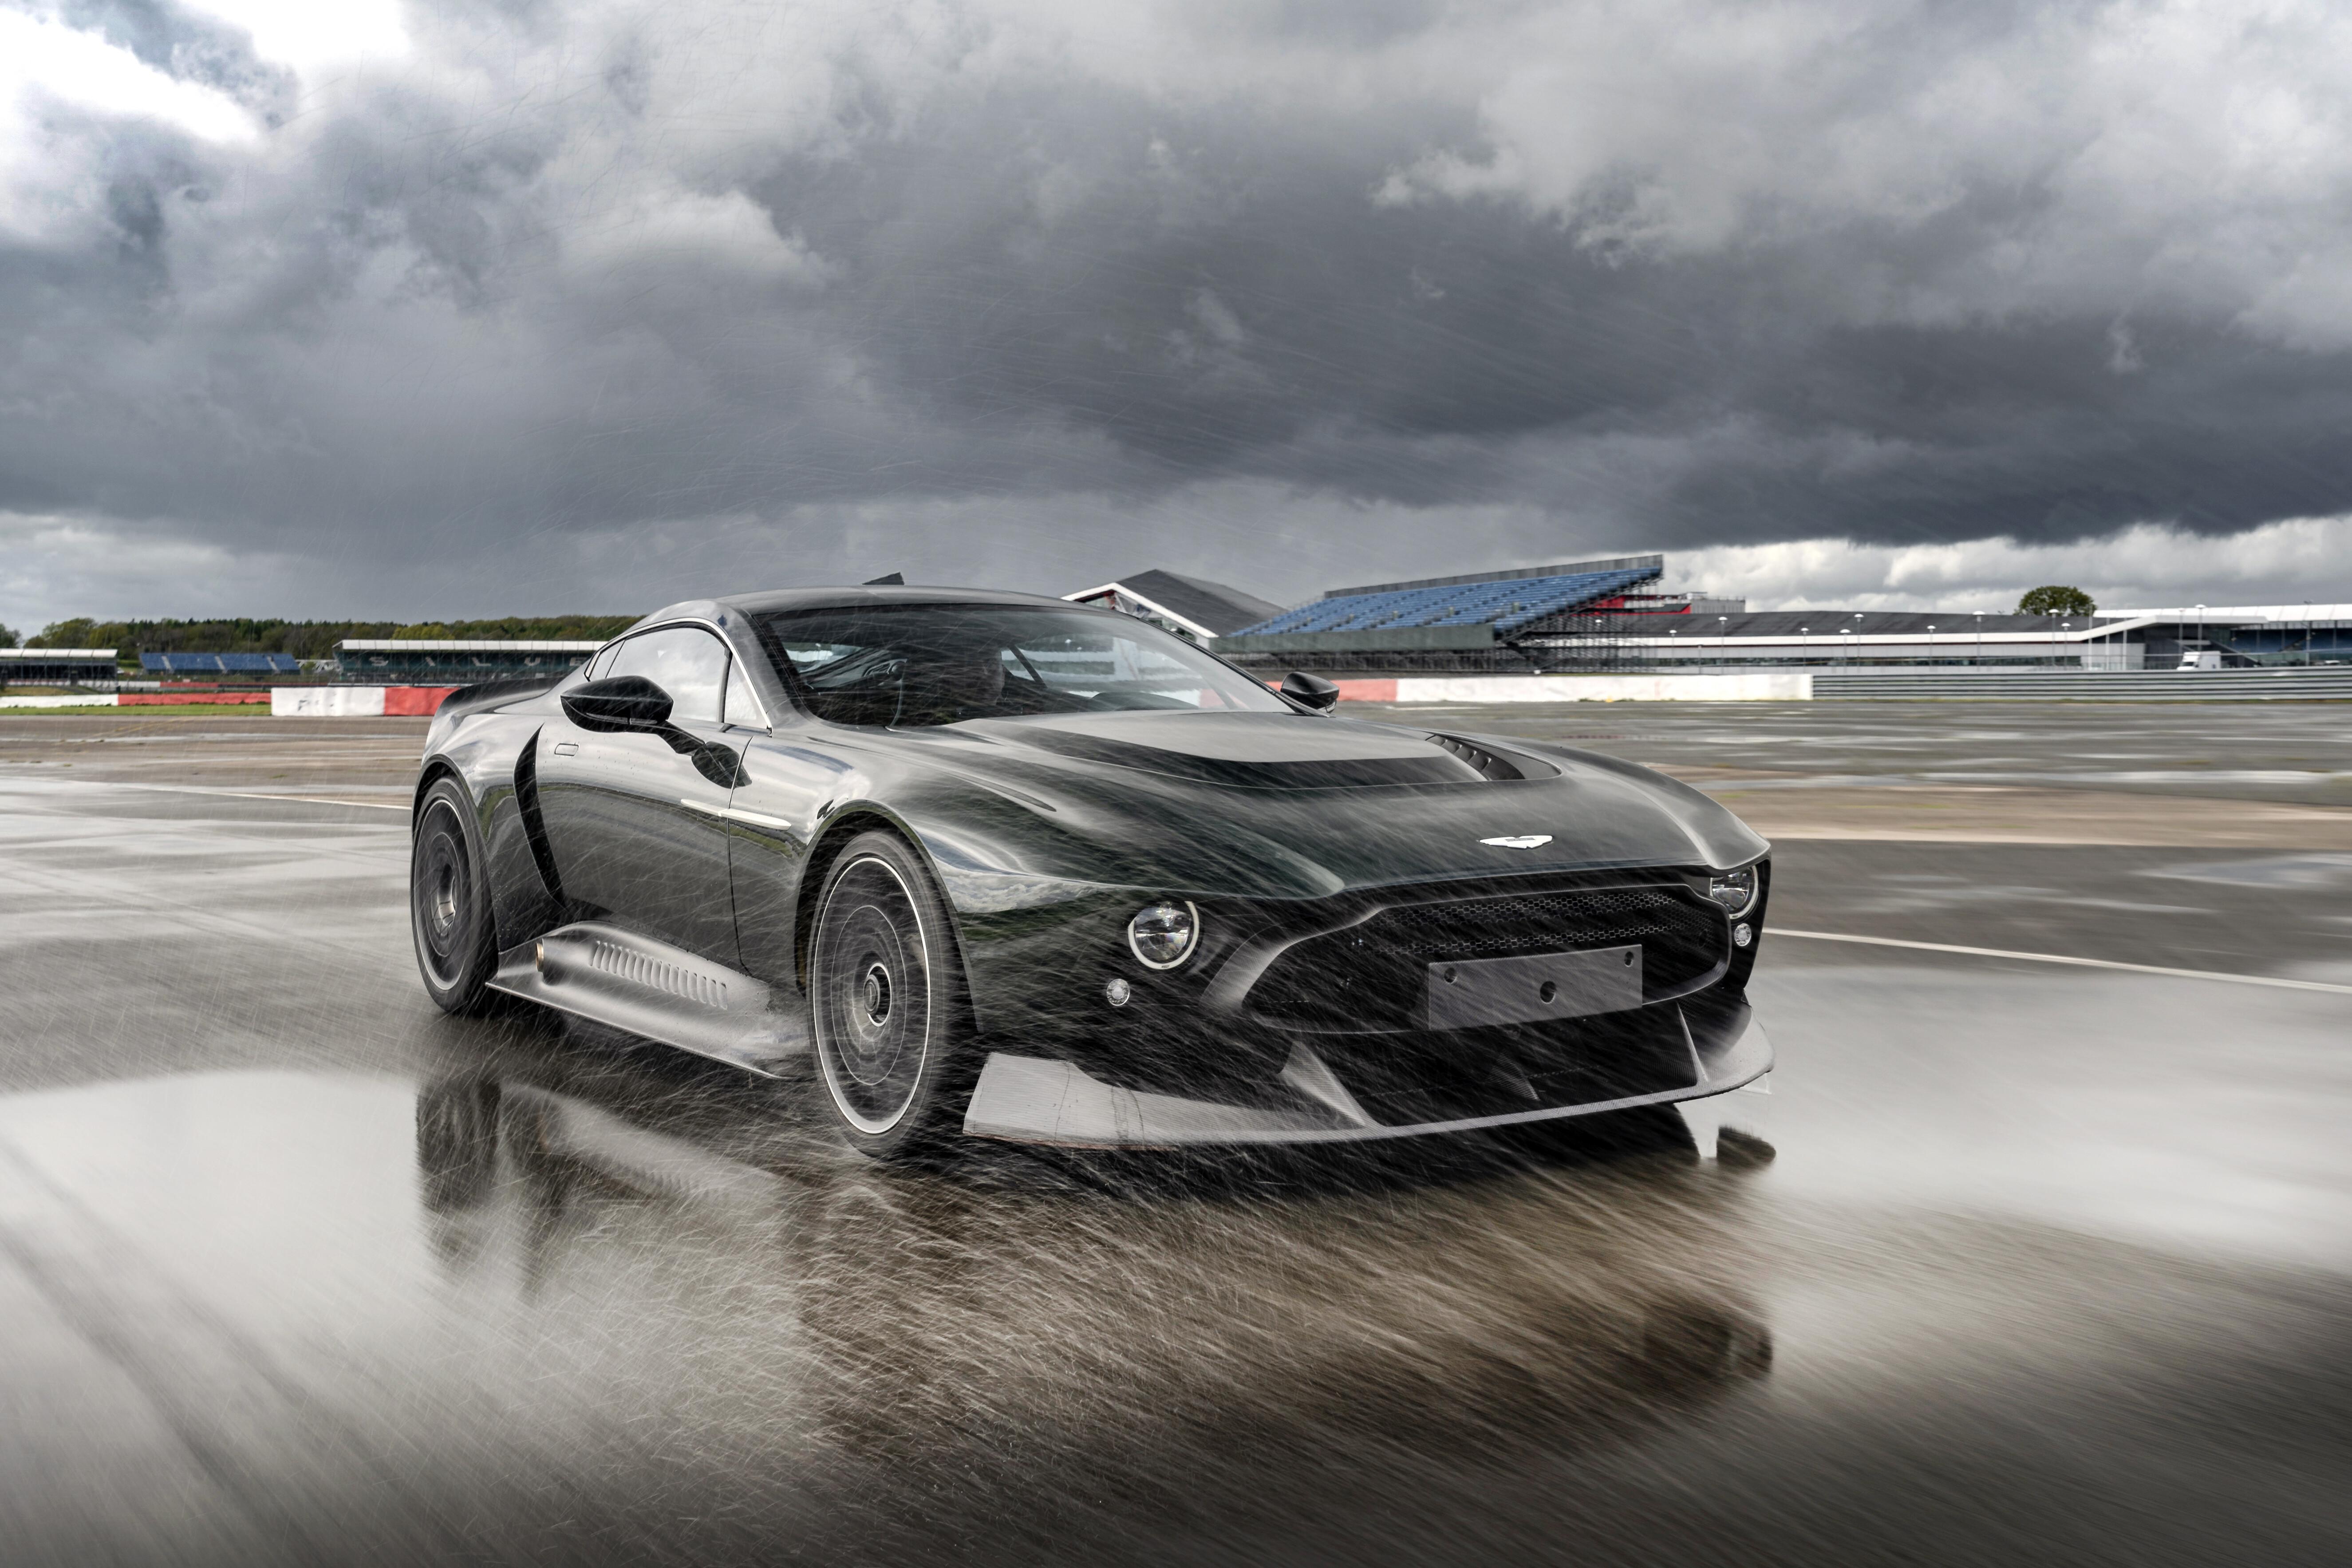 Motor Reviews Kyle Fortune Aston Martin Victor Photo Max Earey 076